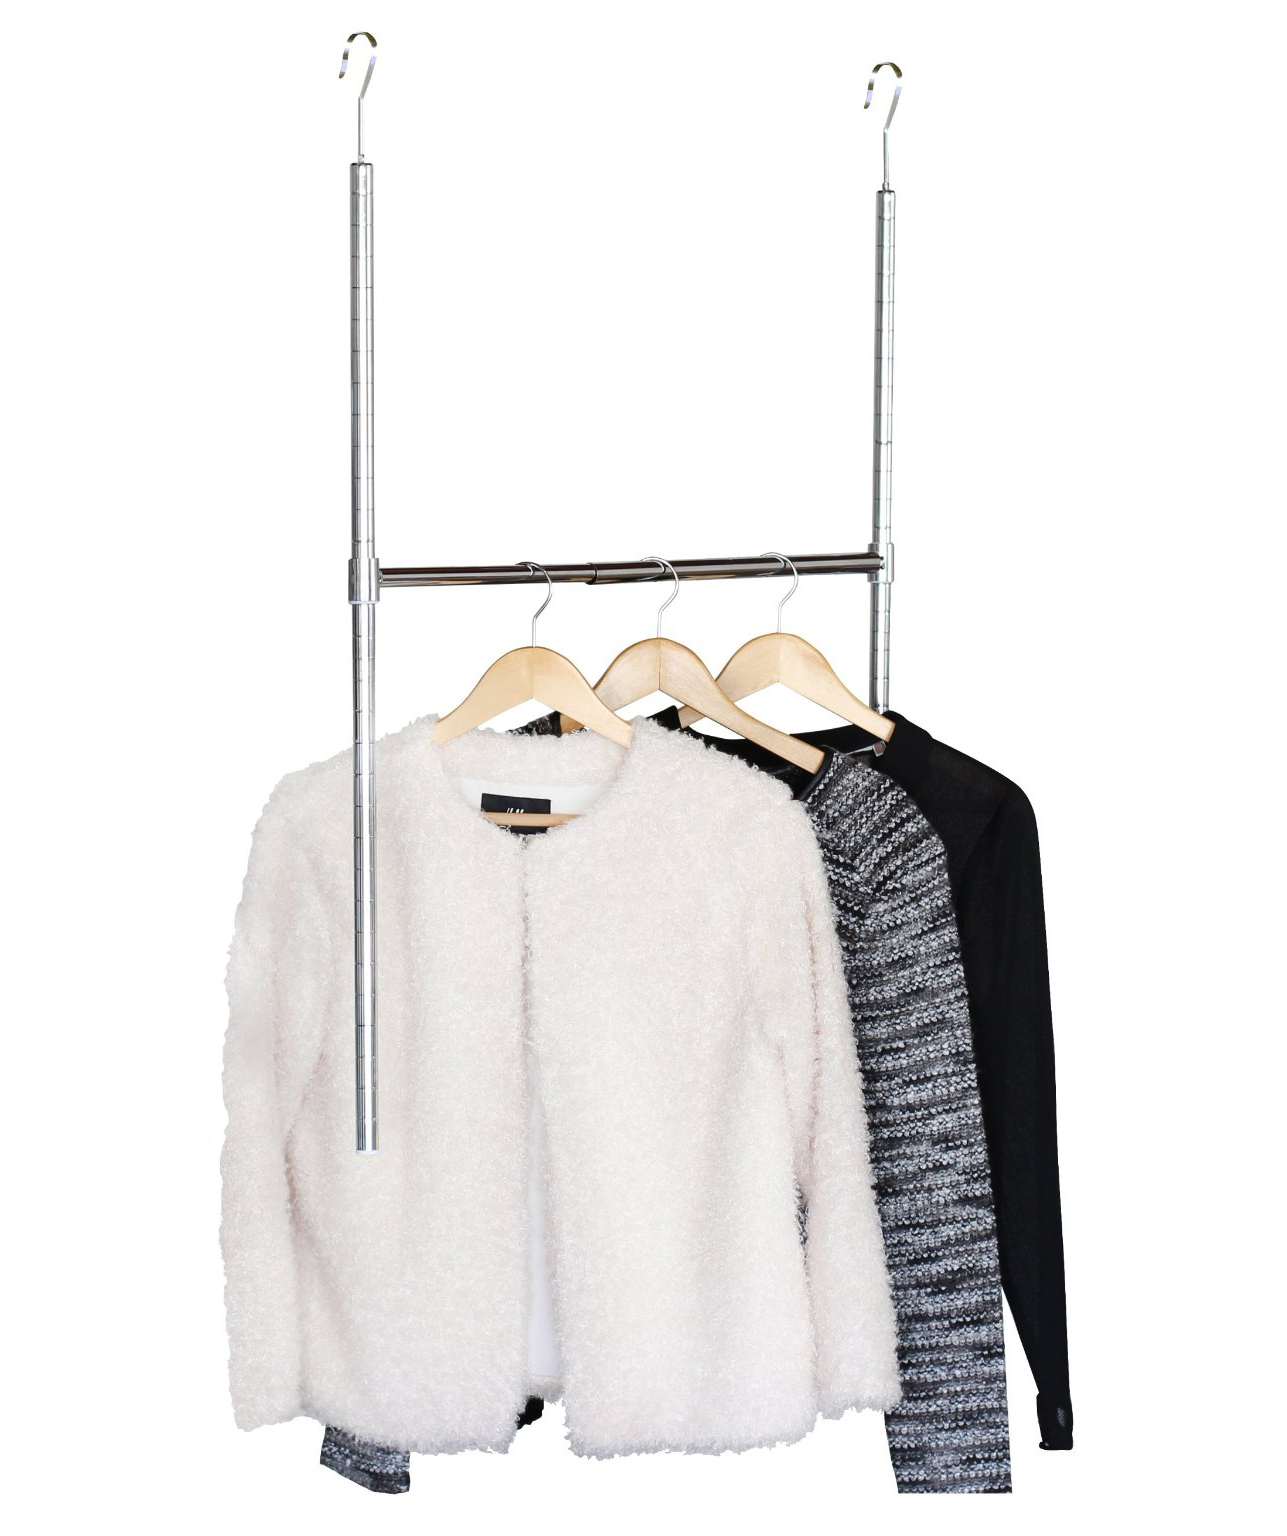 Hanging Closet Organizer Options To Buy Or Diy Apartment